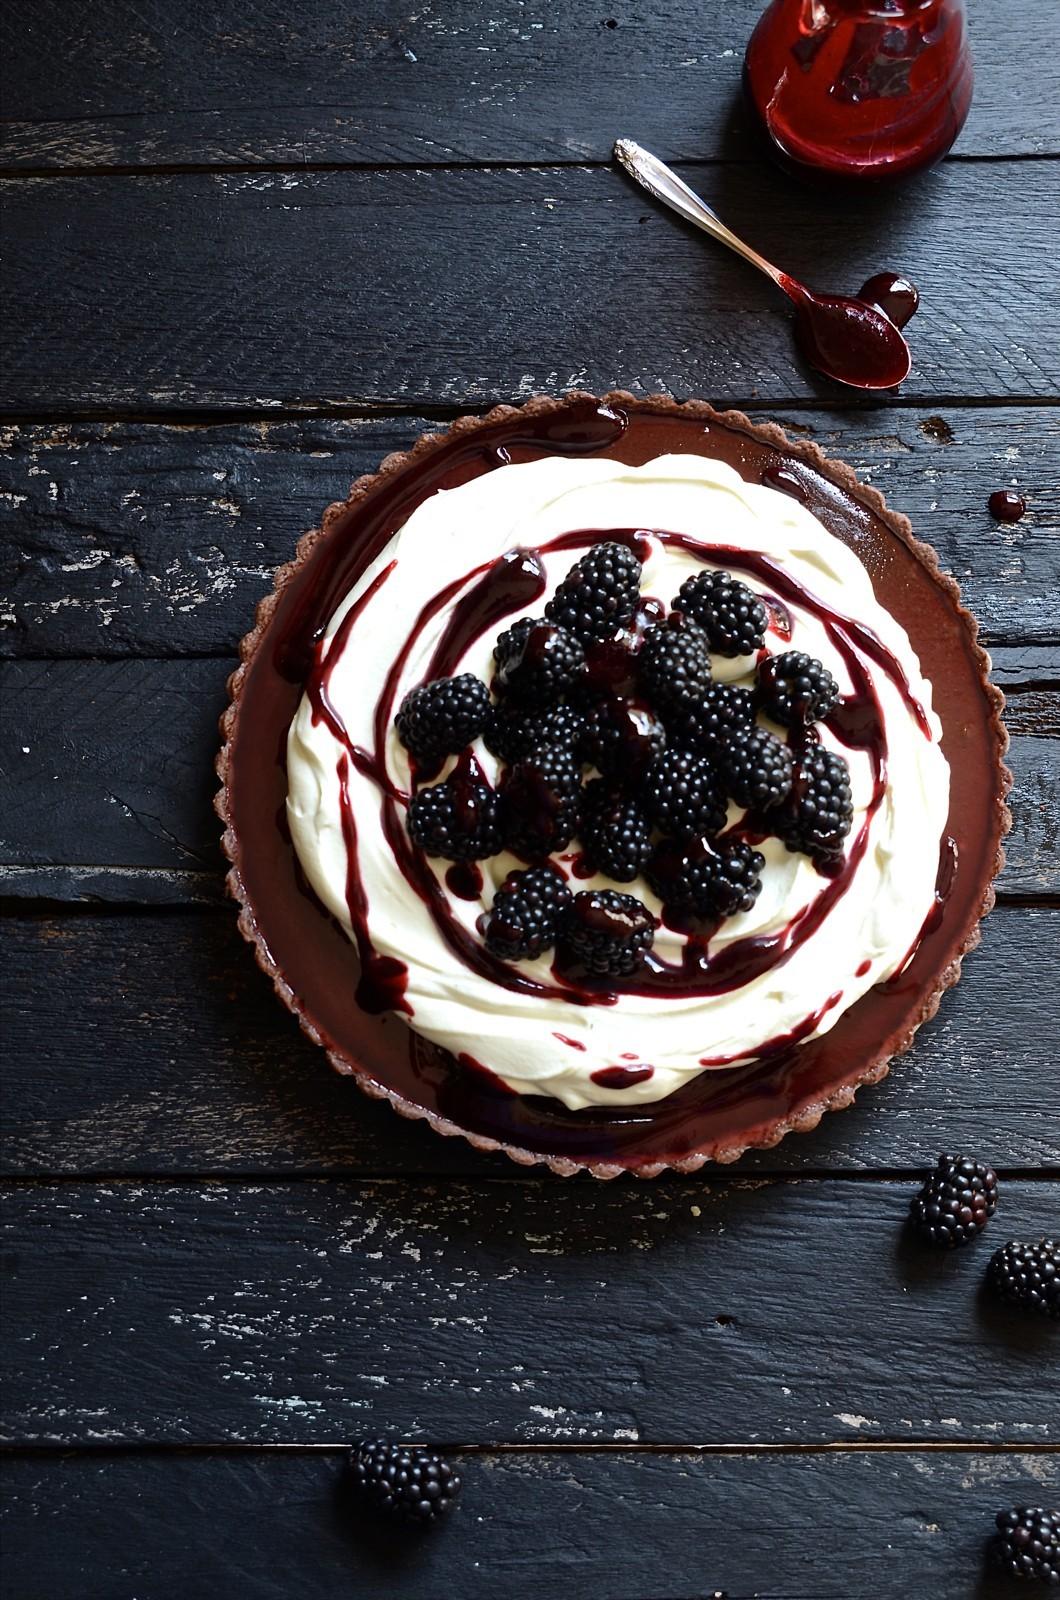 Baked blackberry chocolate fondant tart | Bibbyskitchen desserts